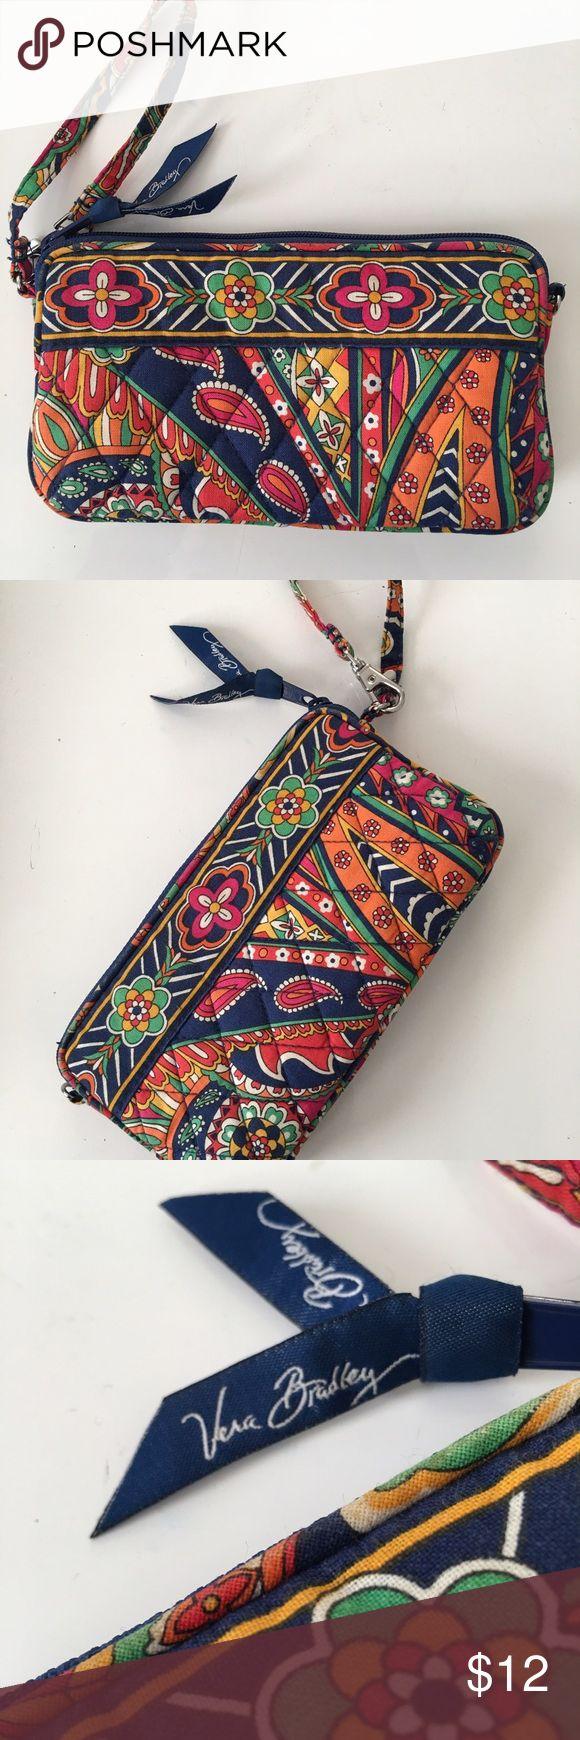 Beautiful Vera Bradley Wristlet  Very cute Vera Bradley wristlet, awesome pattern ✨ Vera Bradley Bags Clutches & Wristlets